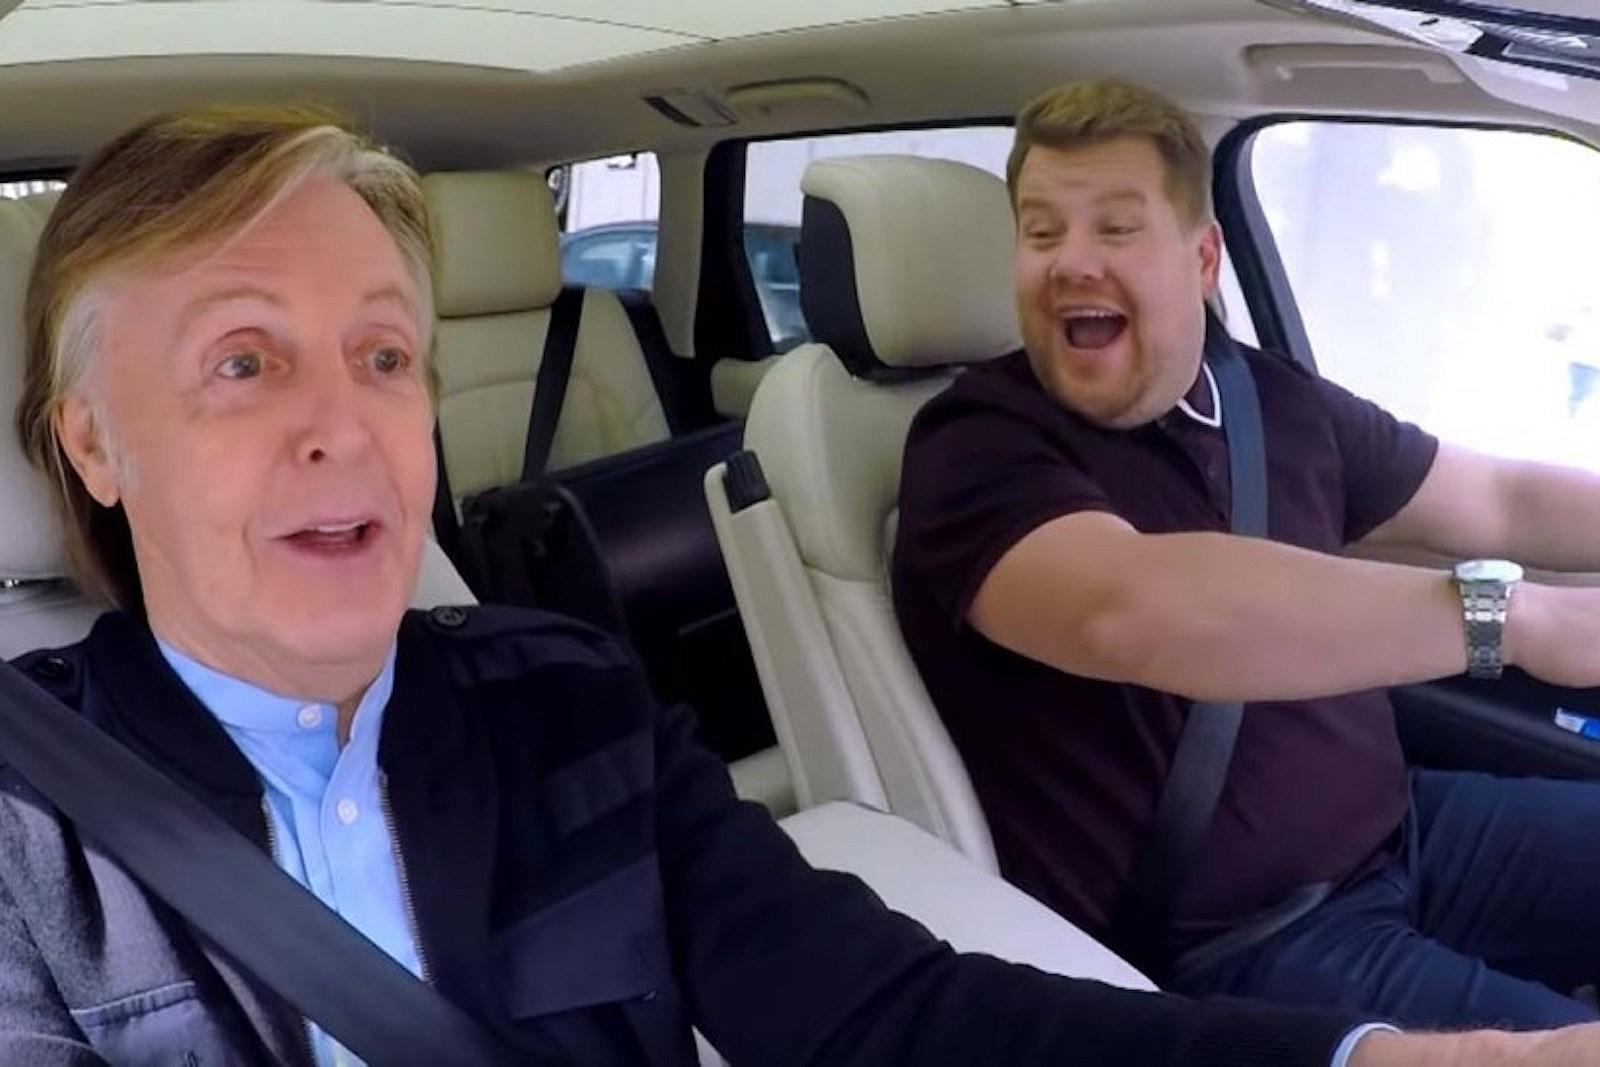 Watch Paul McCartney Return Home on 'Carpool Karaoke'